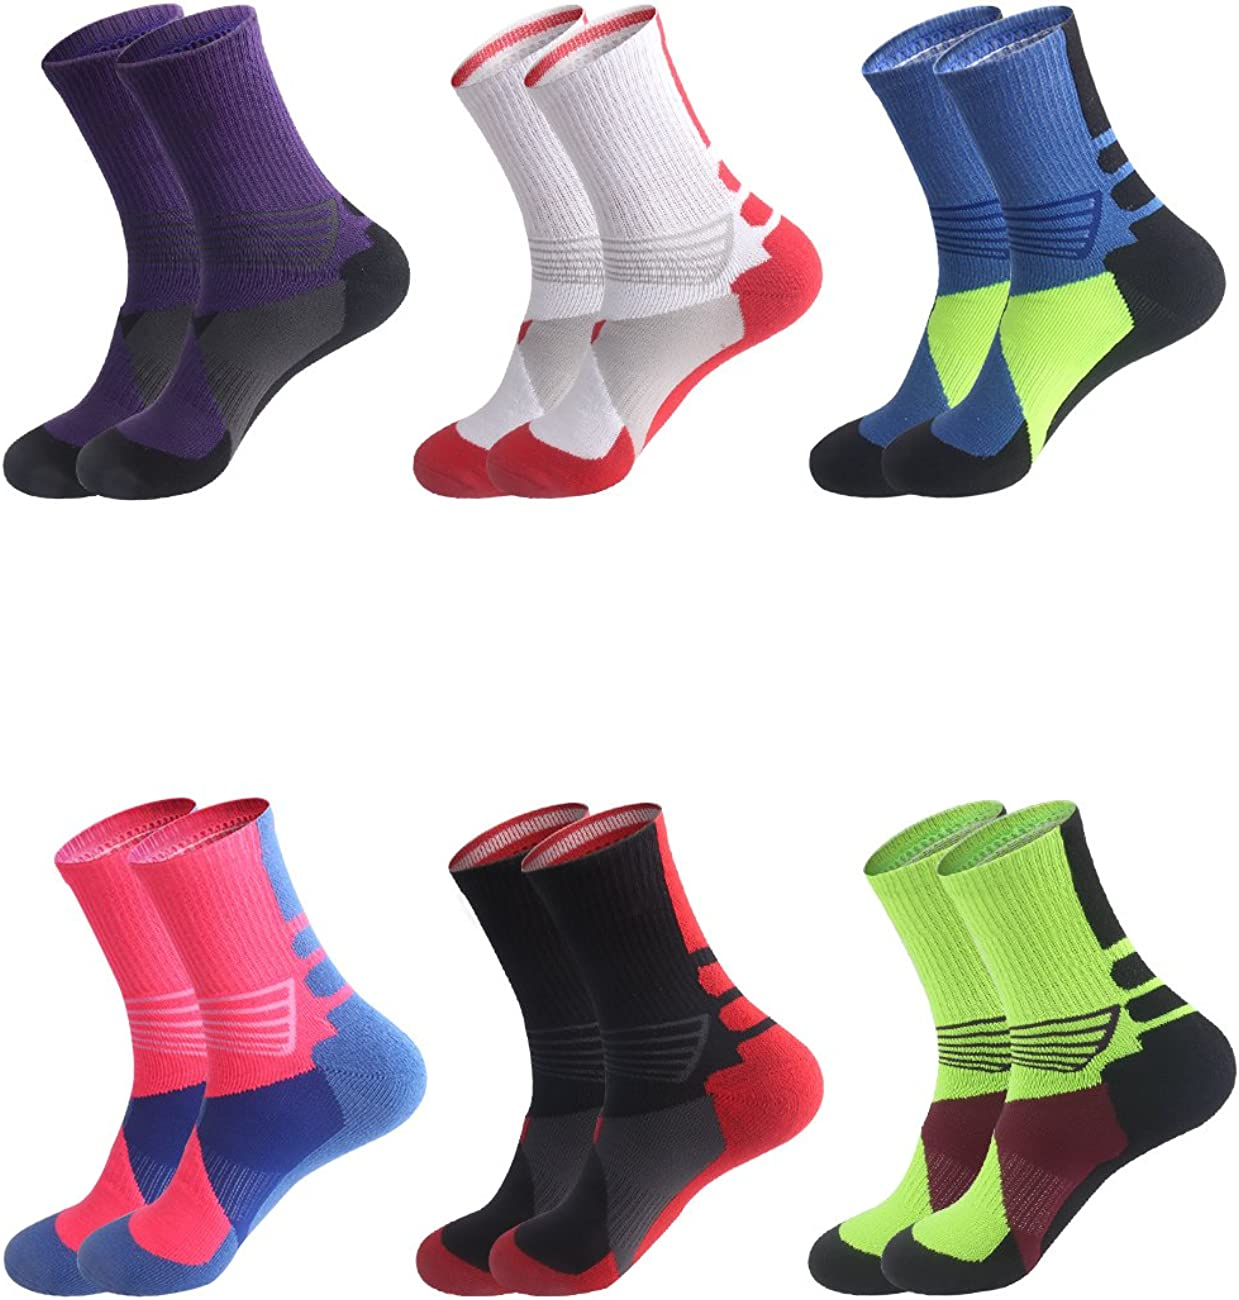 Boys Sock Basketball Soccer Hiking Ski Athletic Outdoor Sports Thick Calf High Crew Socks Multipack